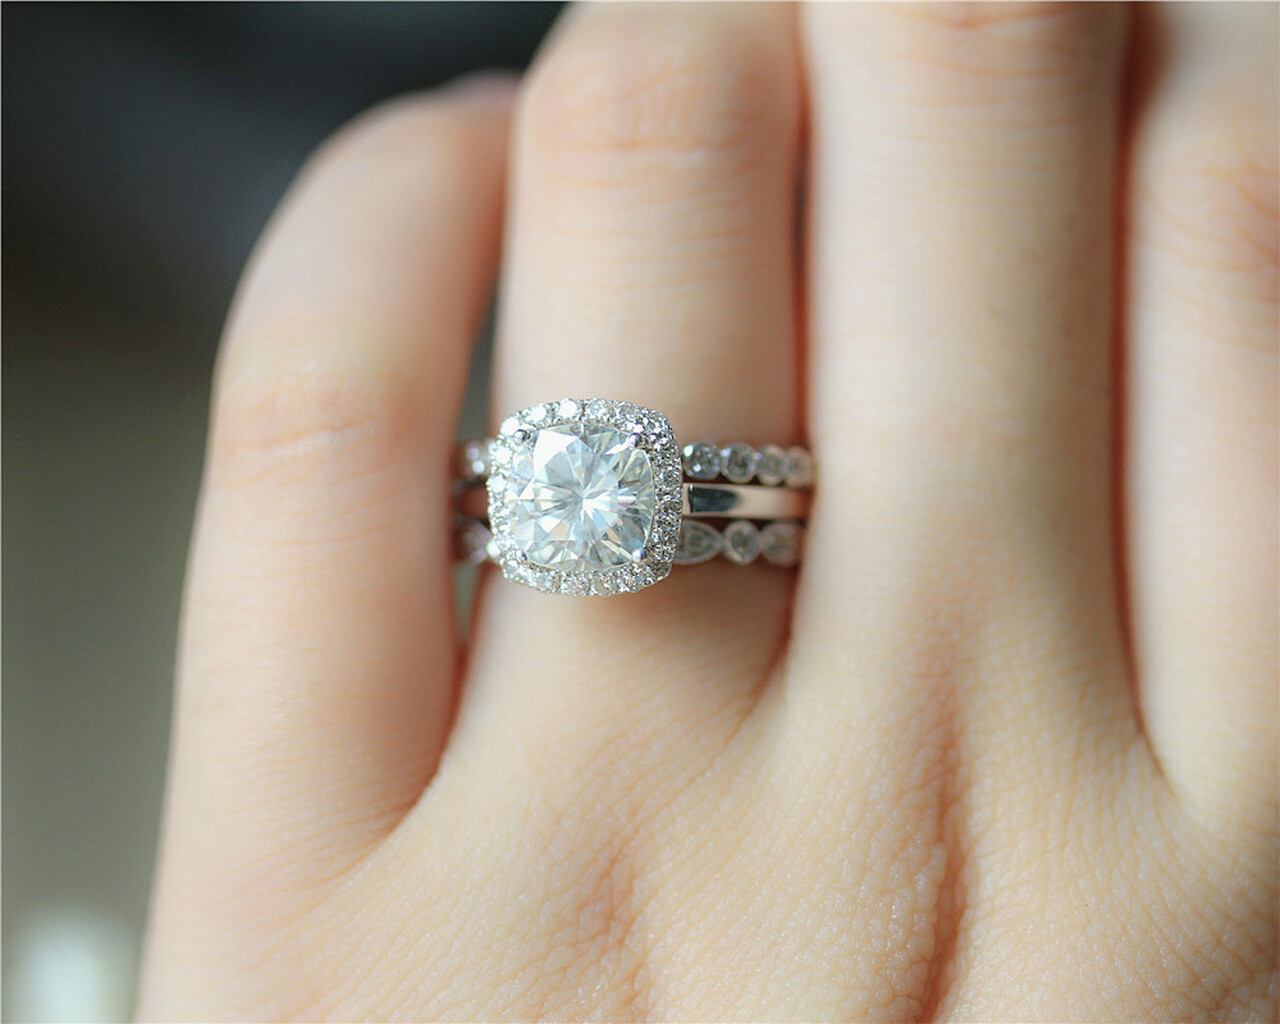 1 7ct Moissanite Ring Set 3 Rings Set Solid 14k White Gold Wedding